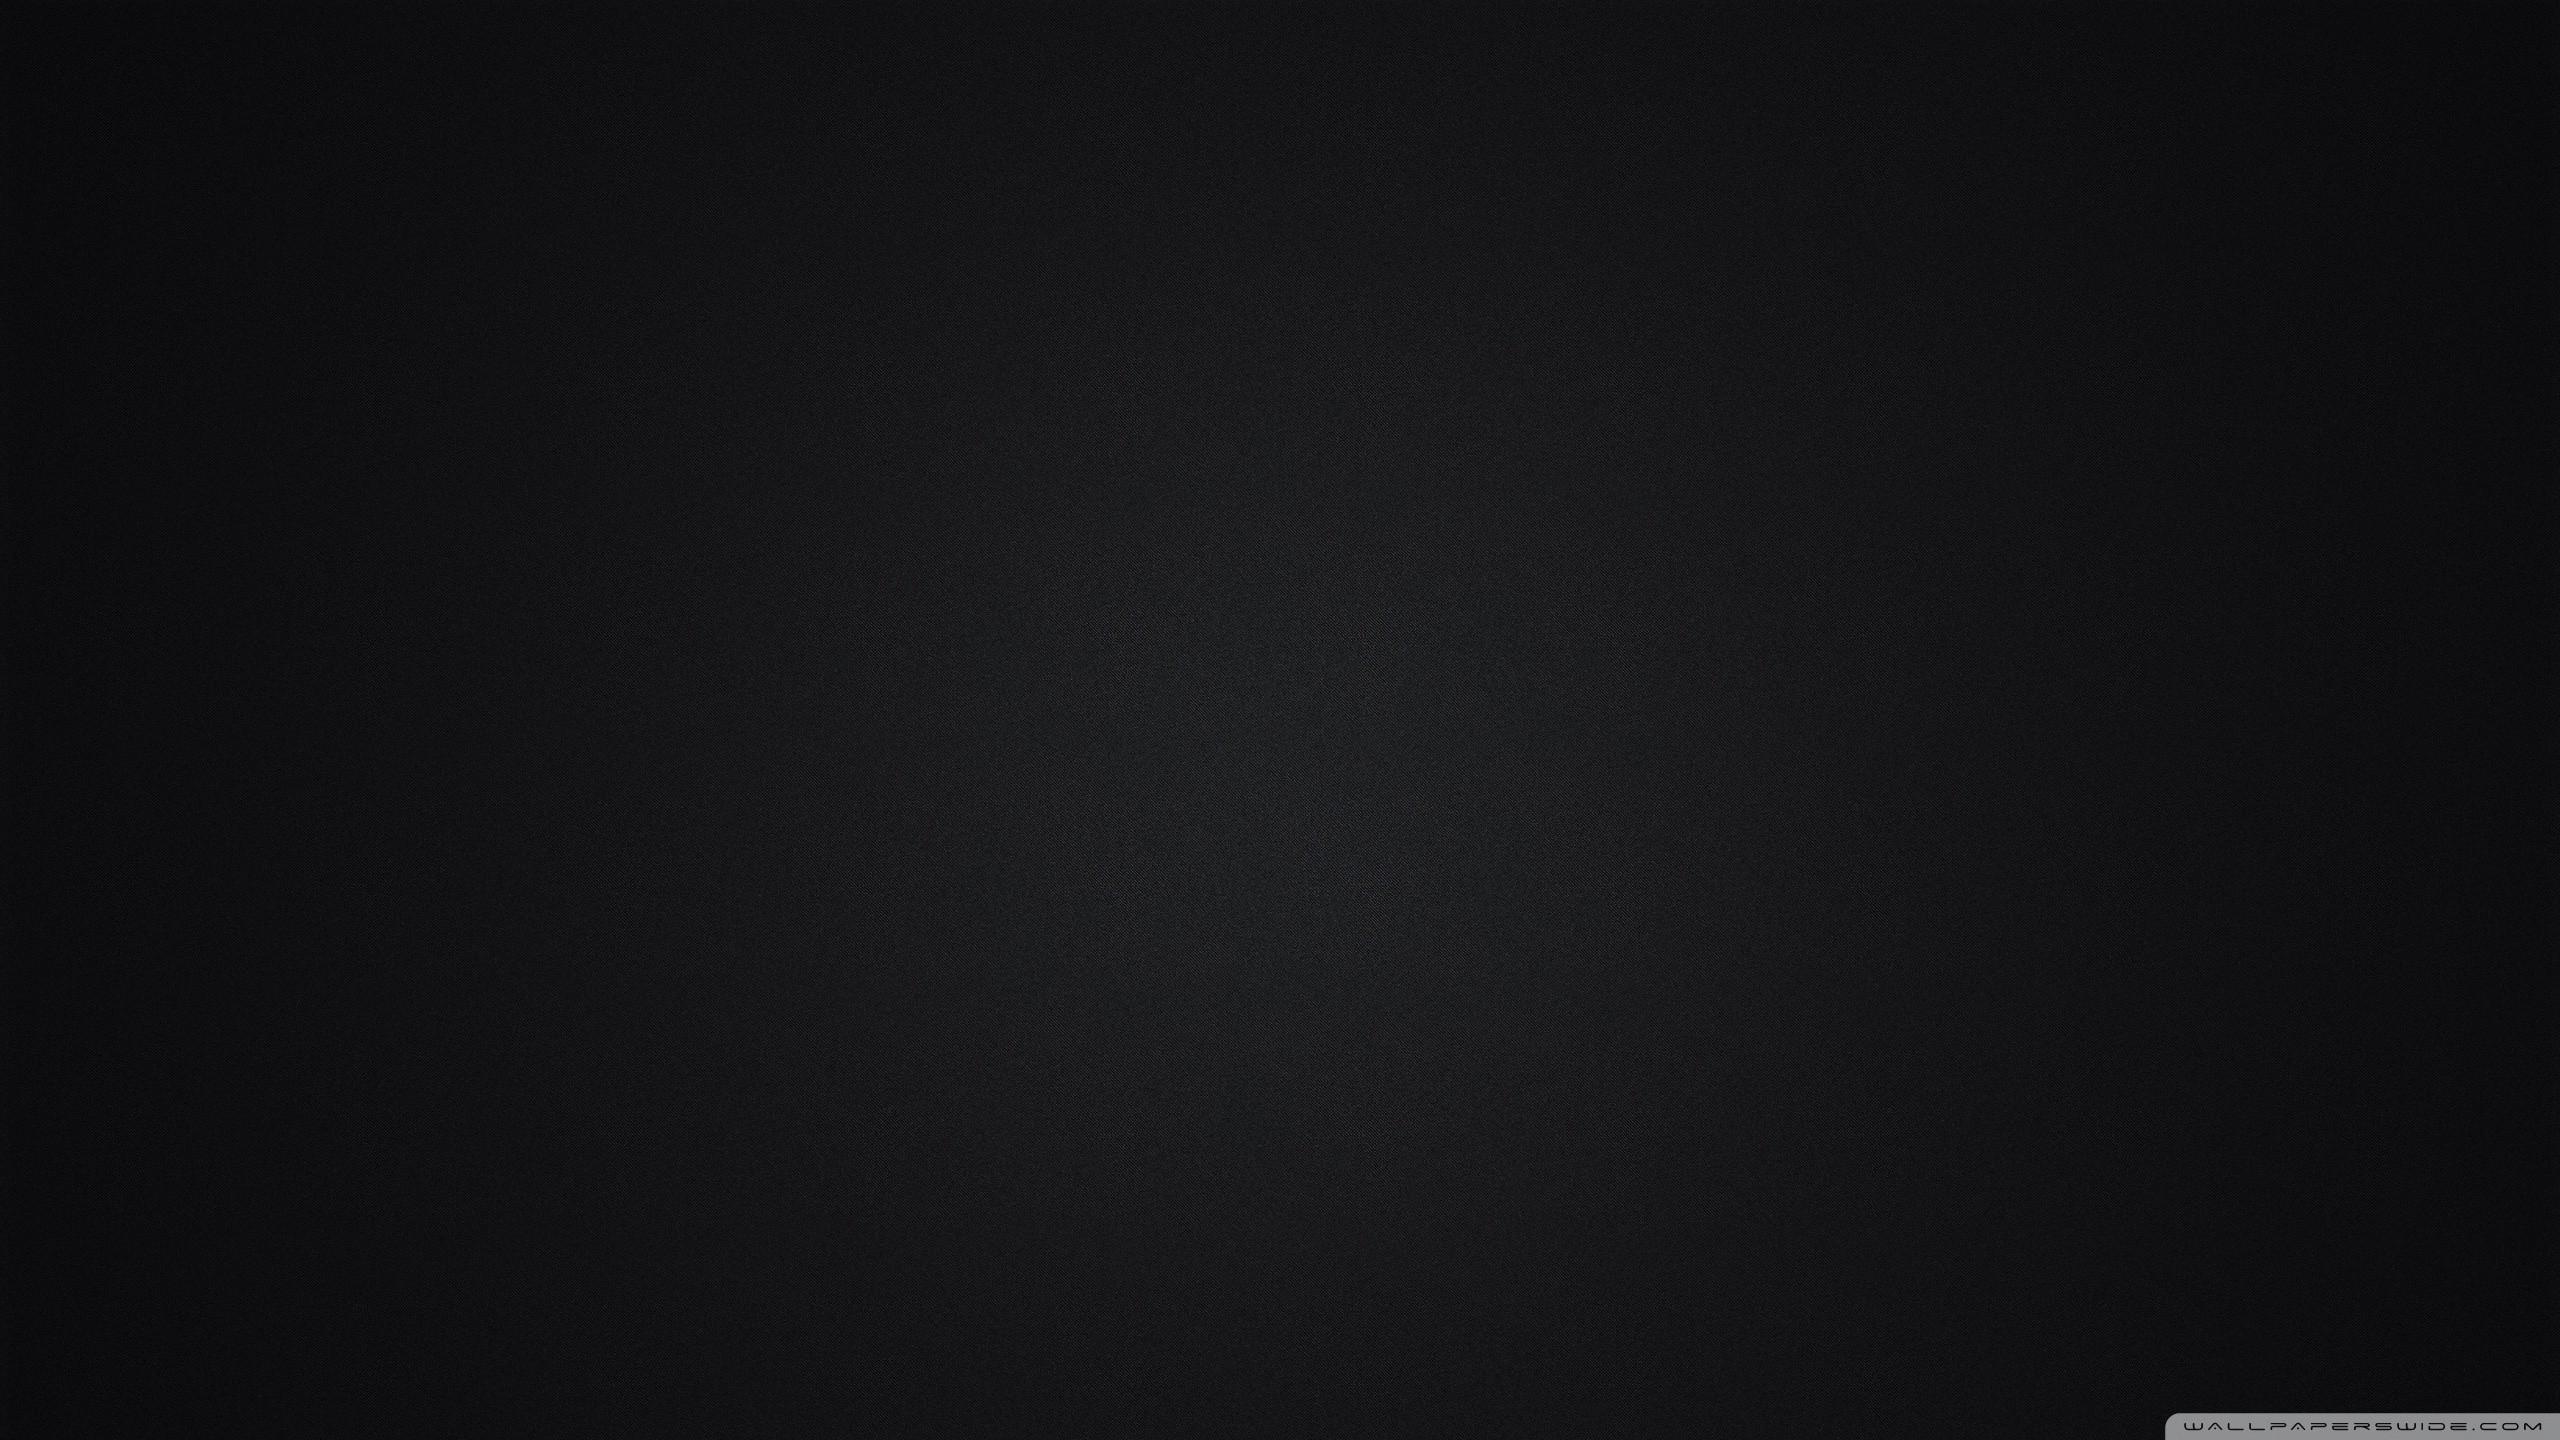 plain black wallpapers hd 74 images